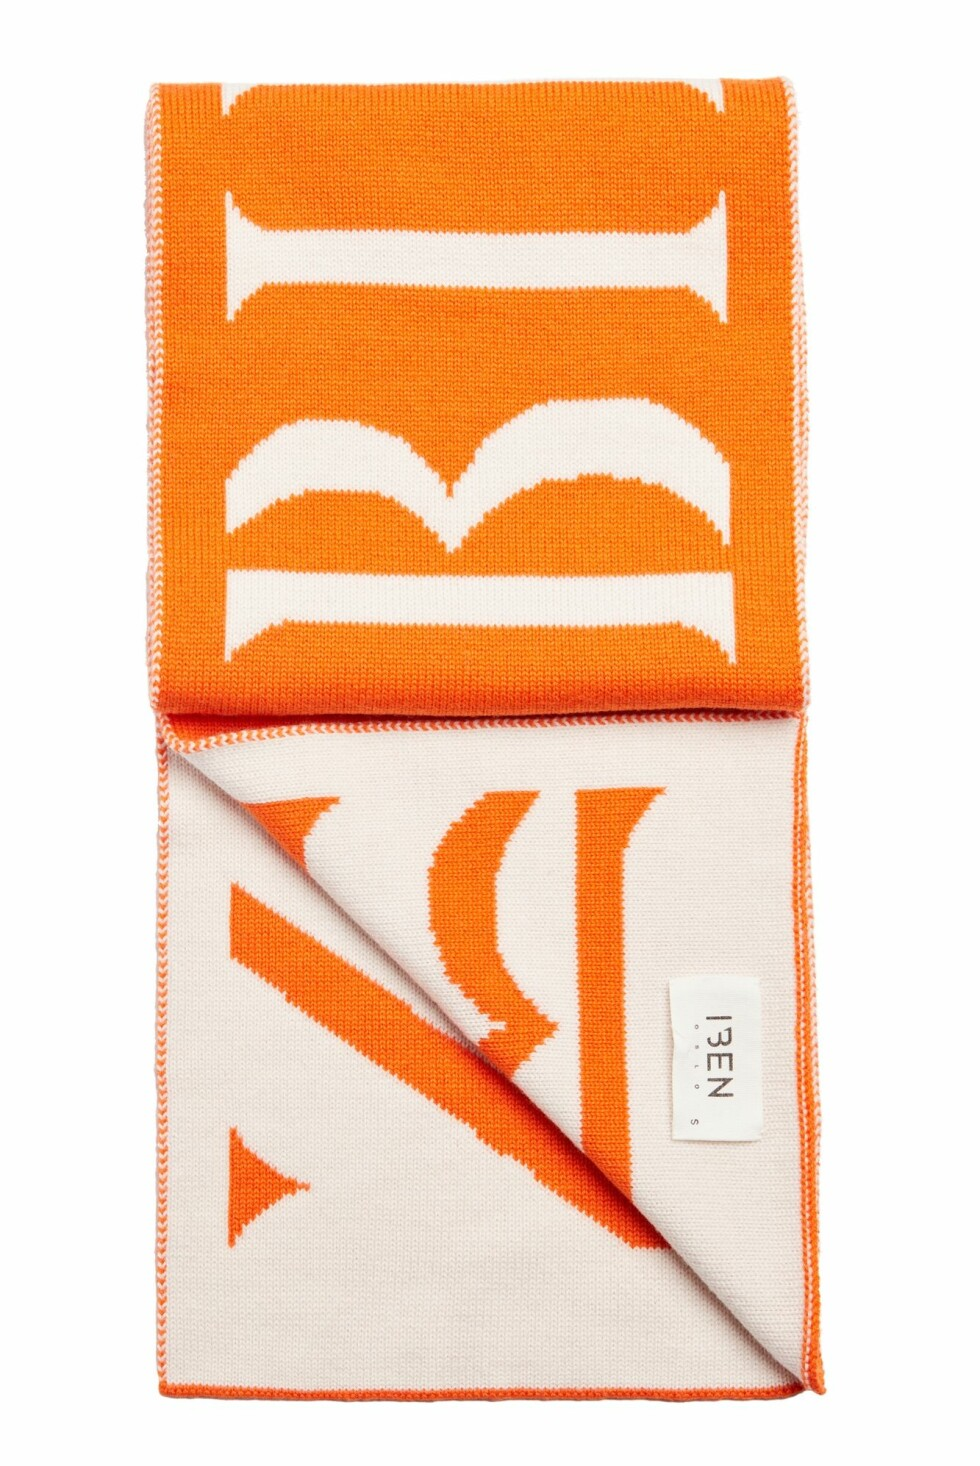 Skjerf fra Iben  1500,-  http://ibenofficial.tictail.com/product/pre-order-mars-scarf